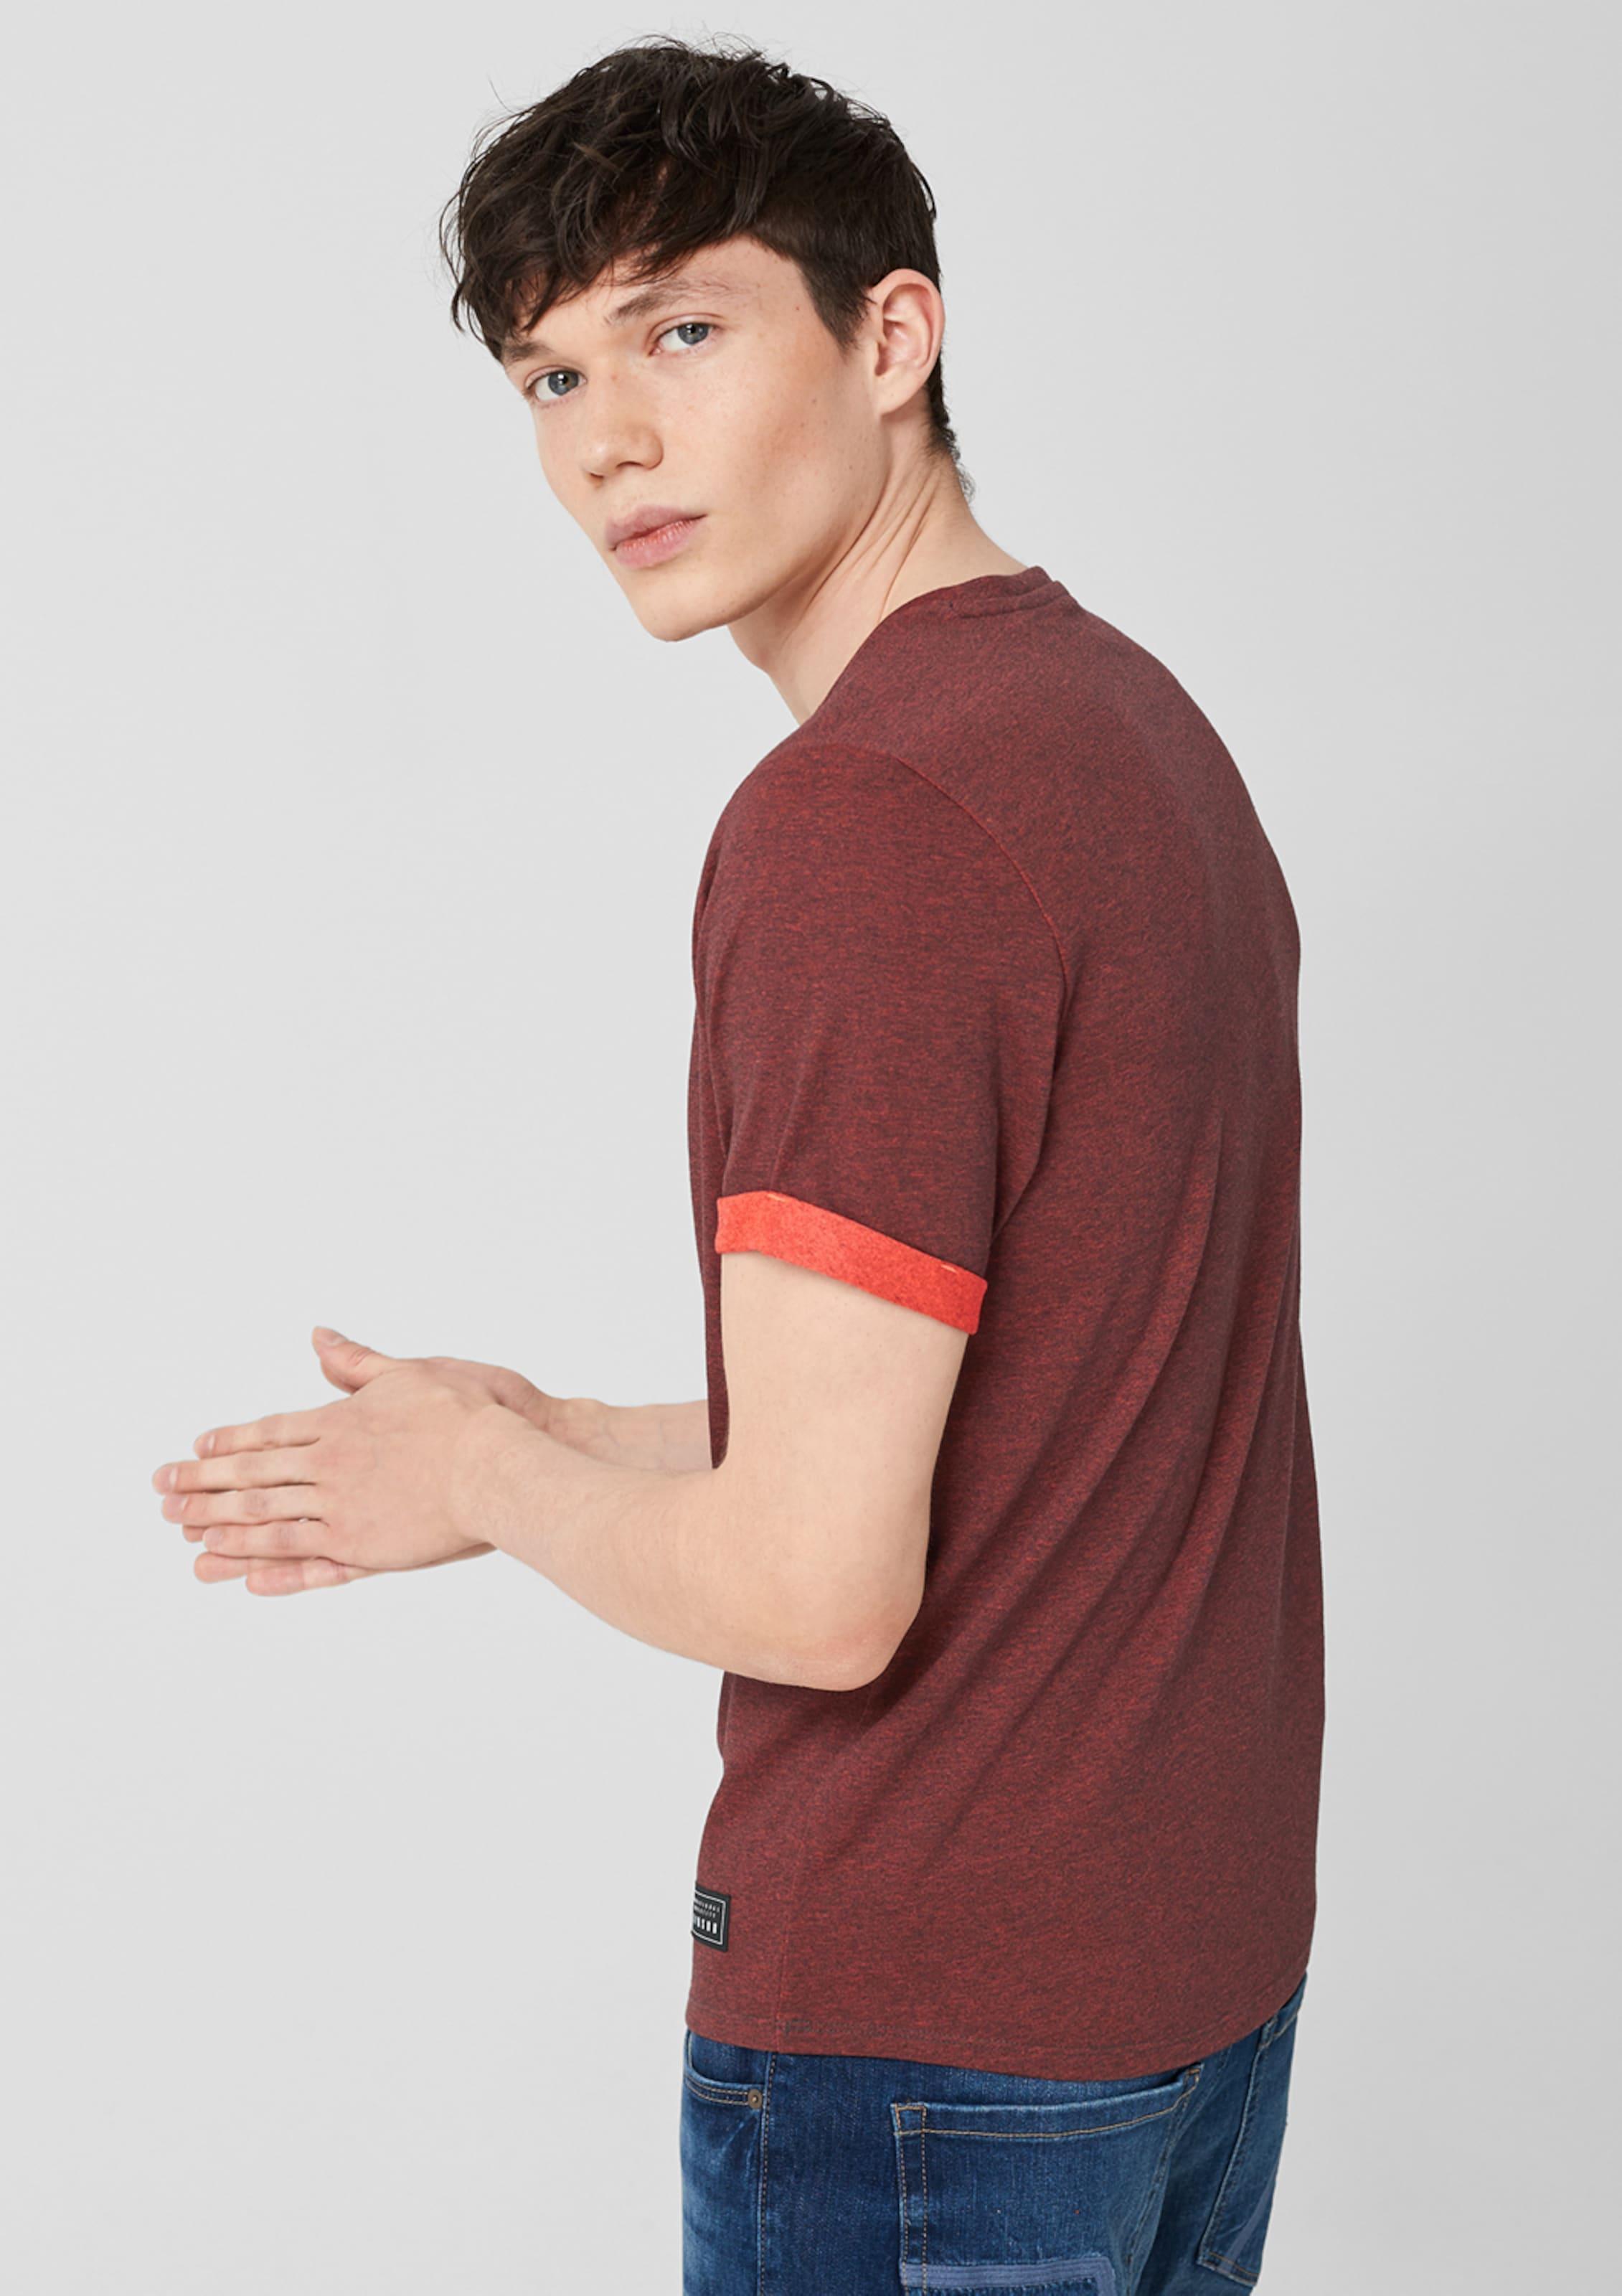 Shirt Designed s In HellrotRotmeliert Q By dhCrtsQ